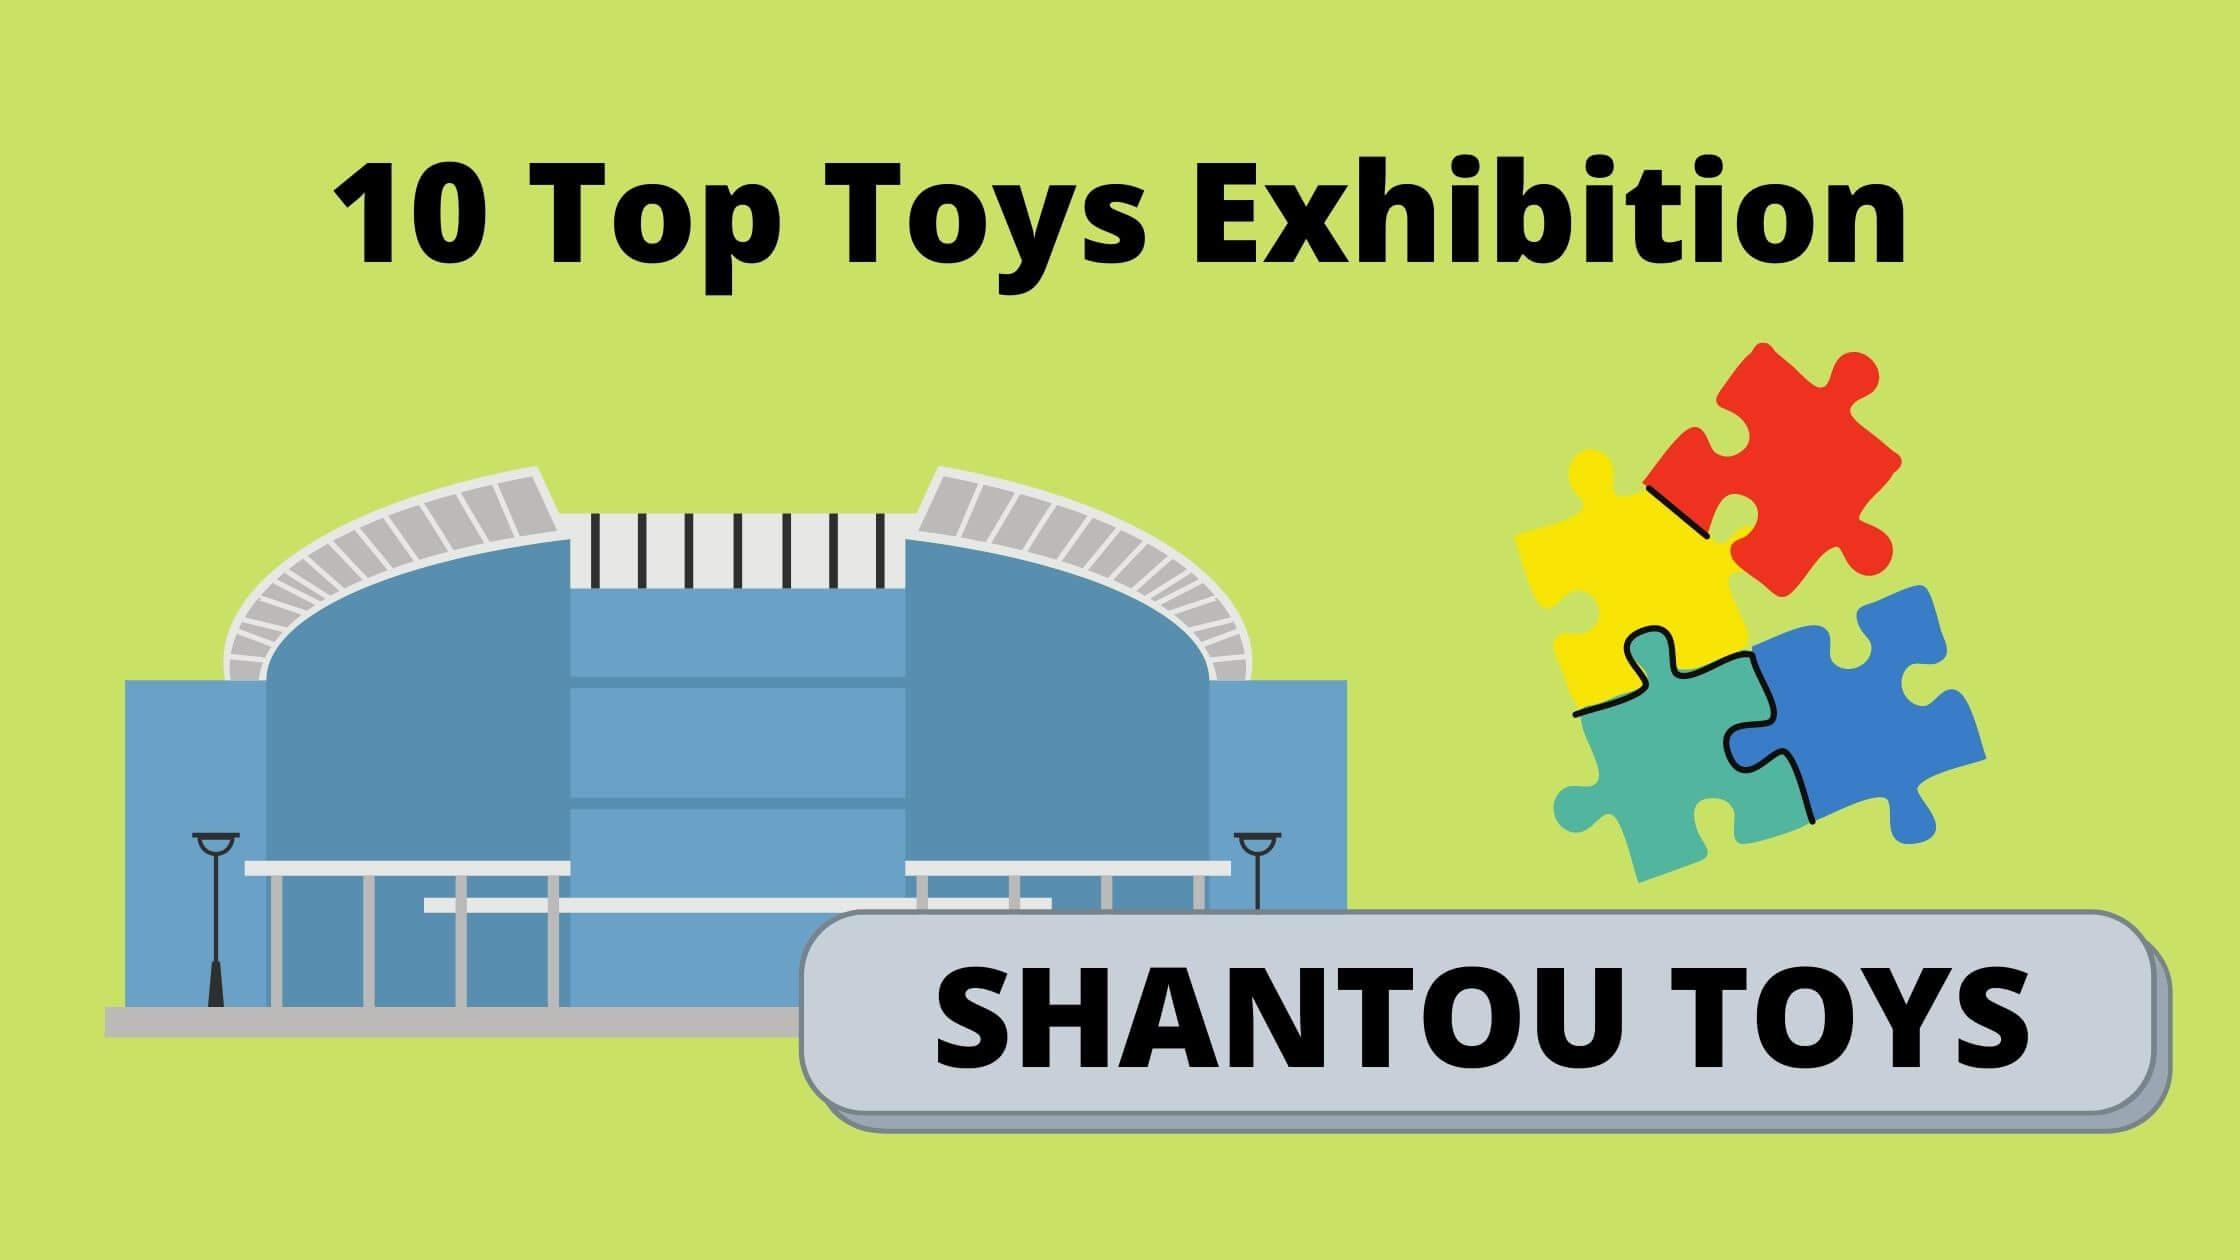 10 Top Toys Exhibition